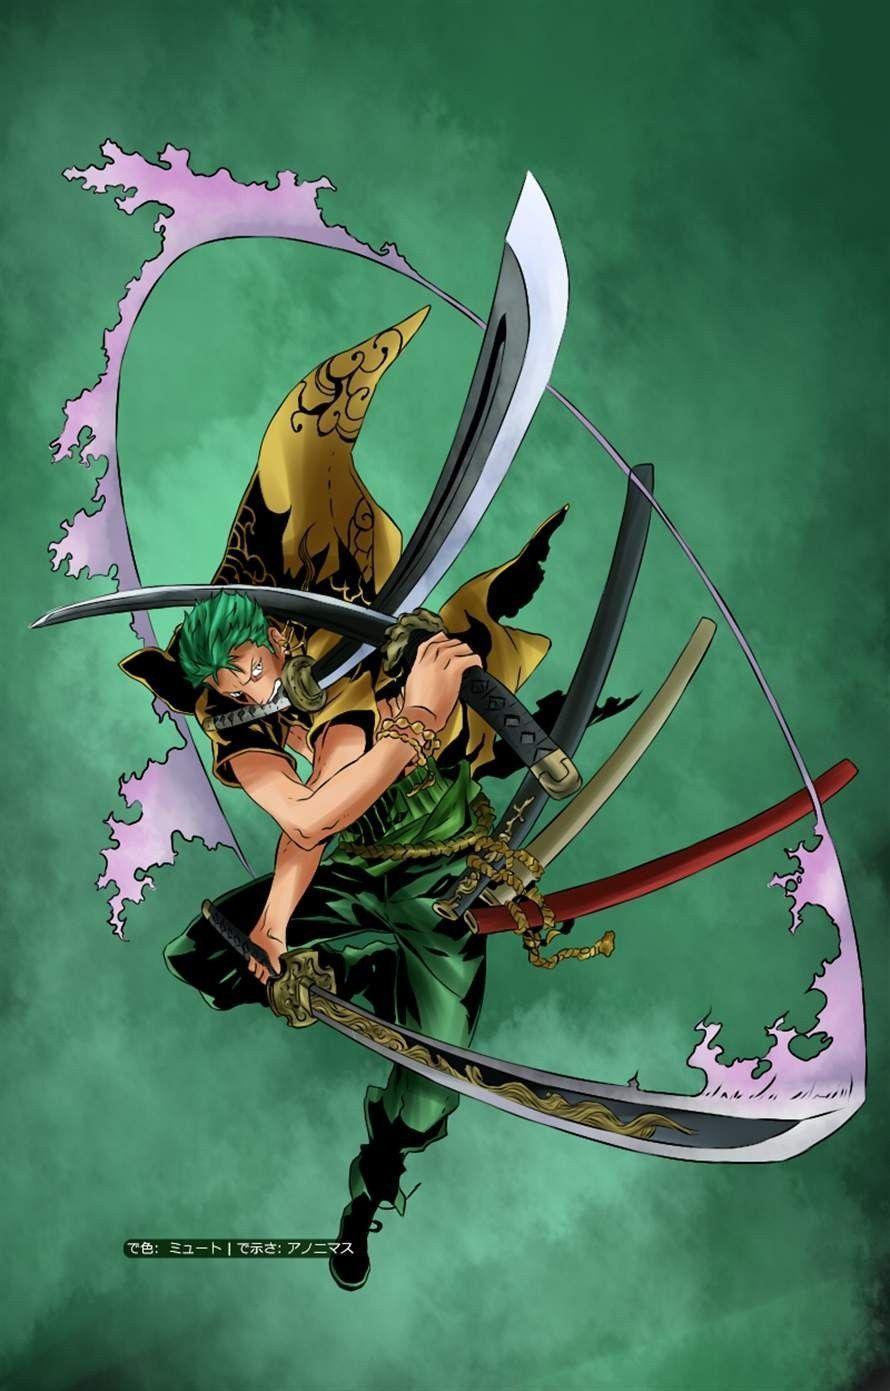 Anime Wallpaper One Piece Zoro